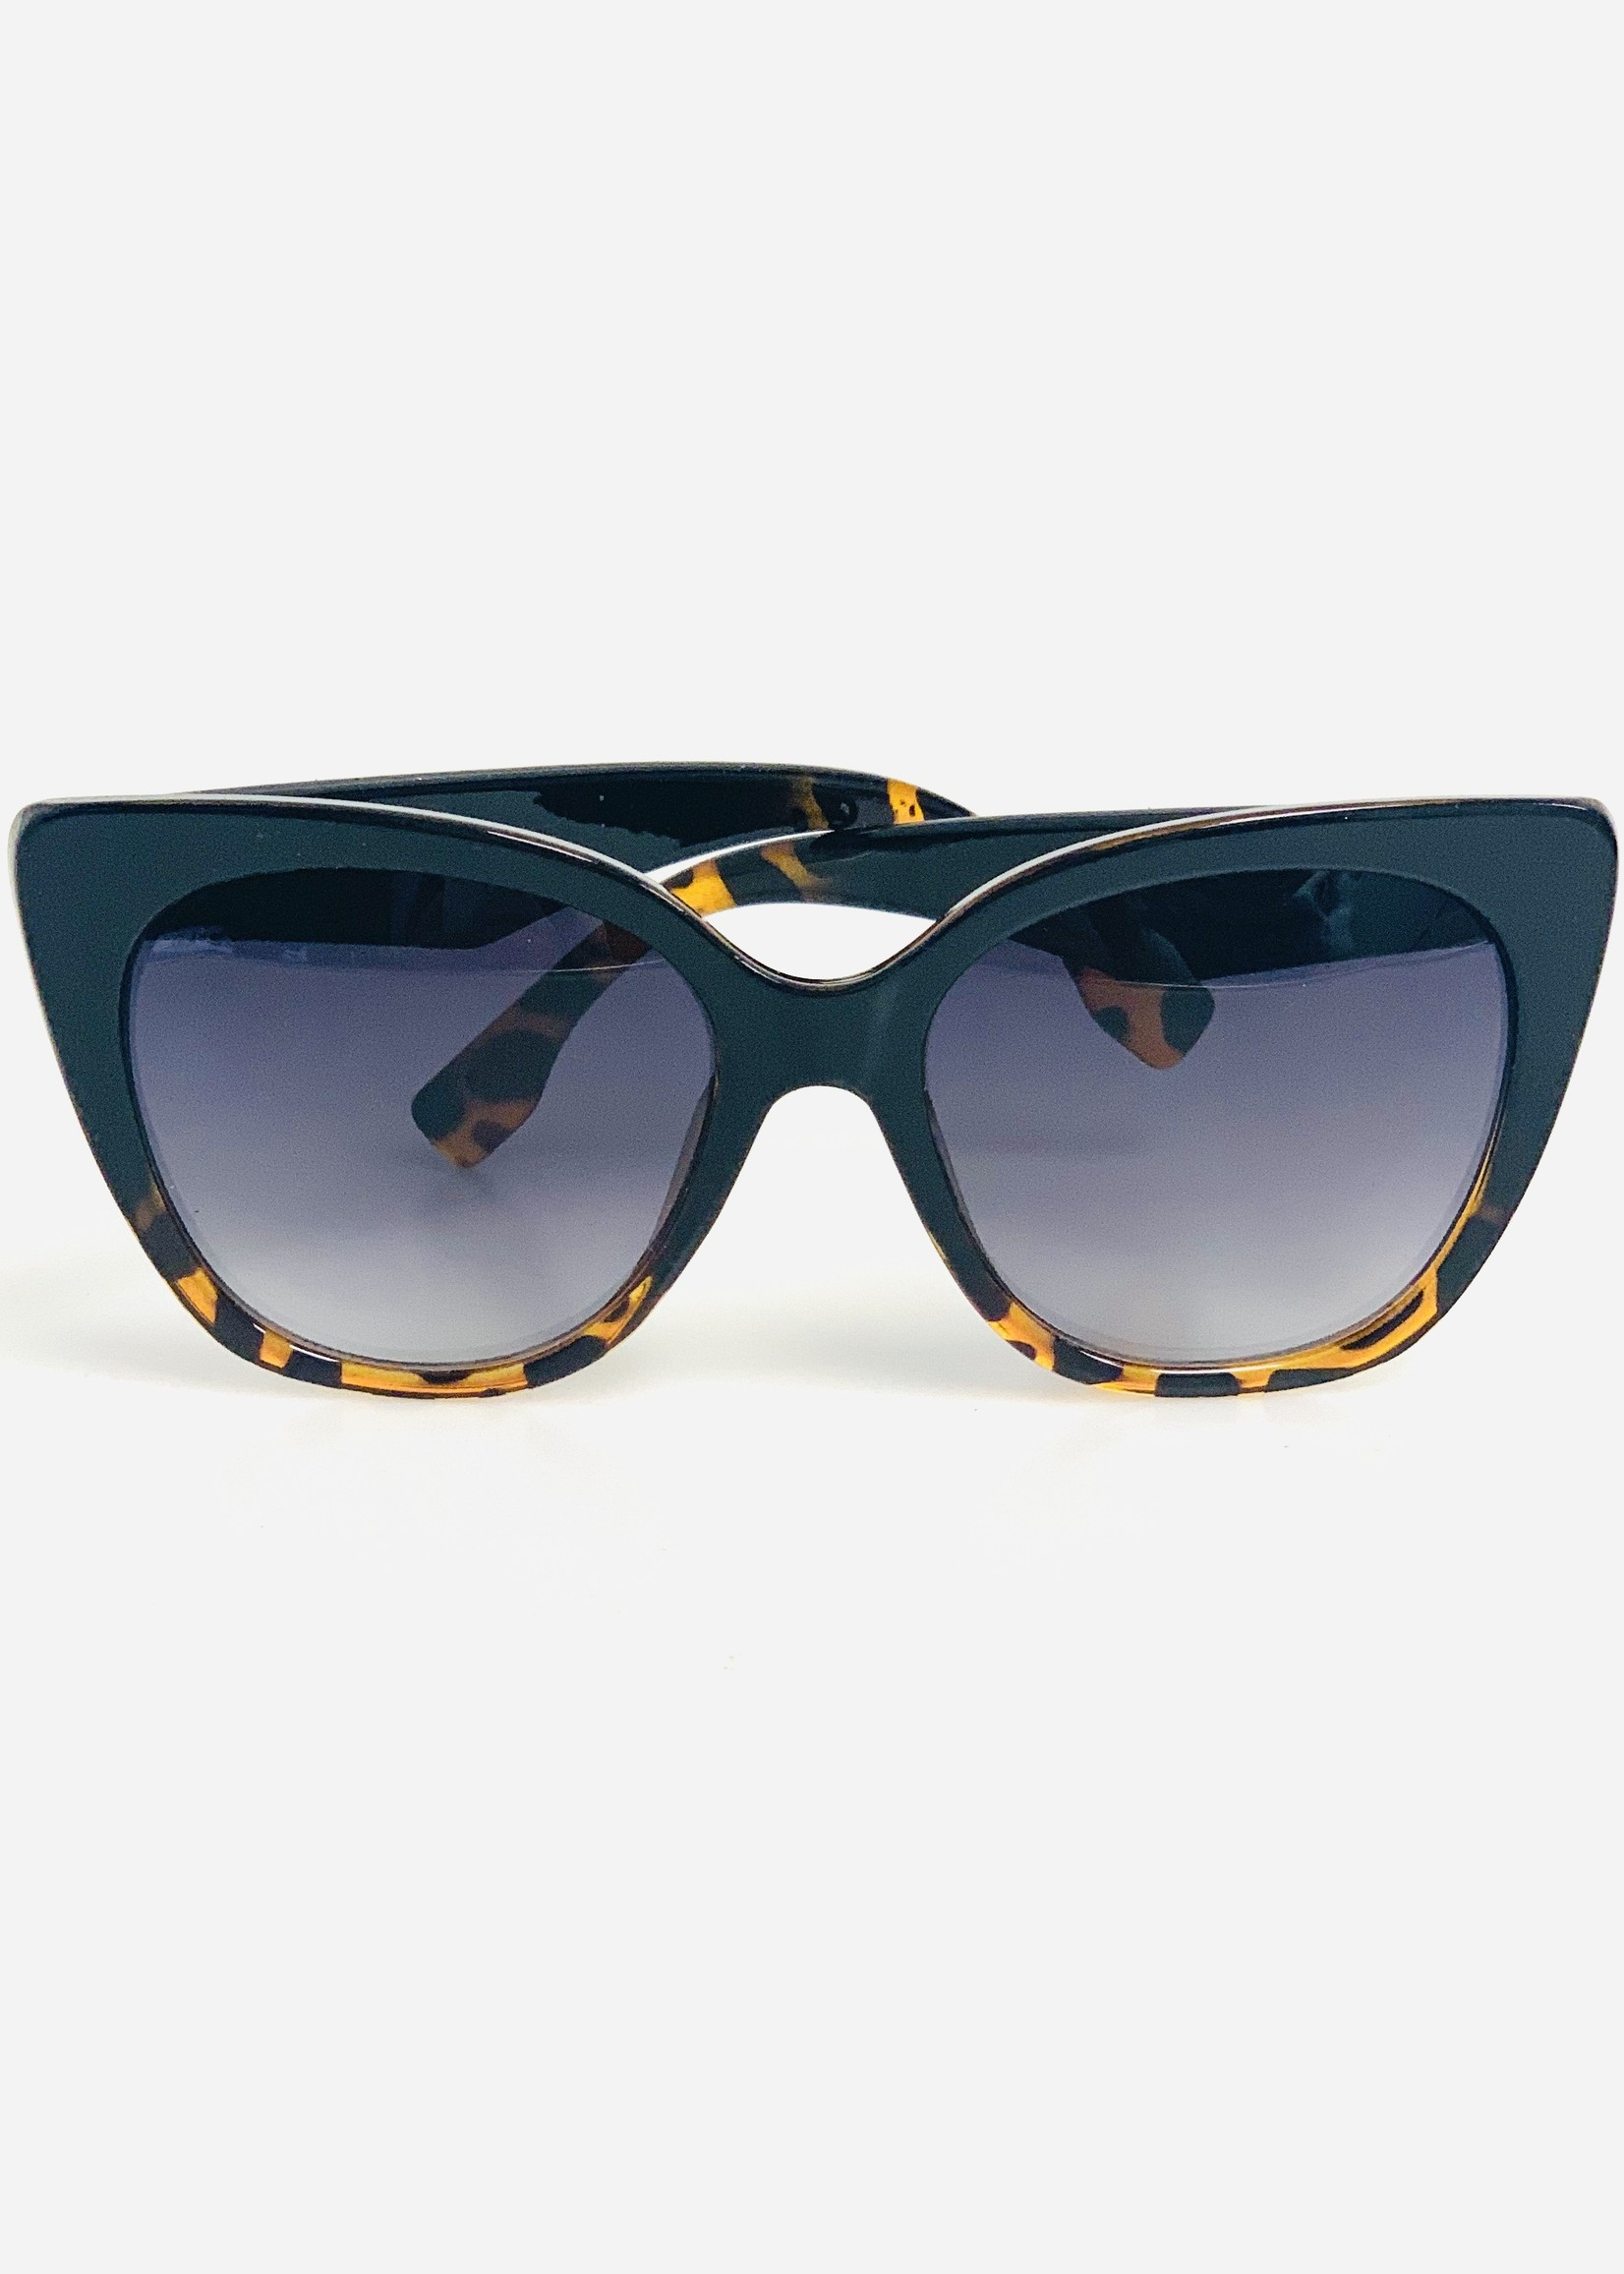 7863 sunglasses